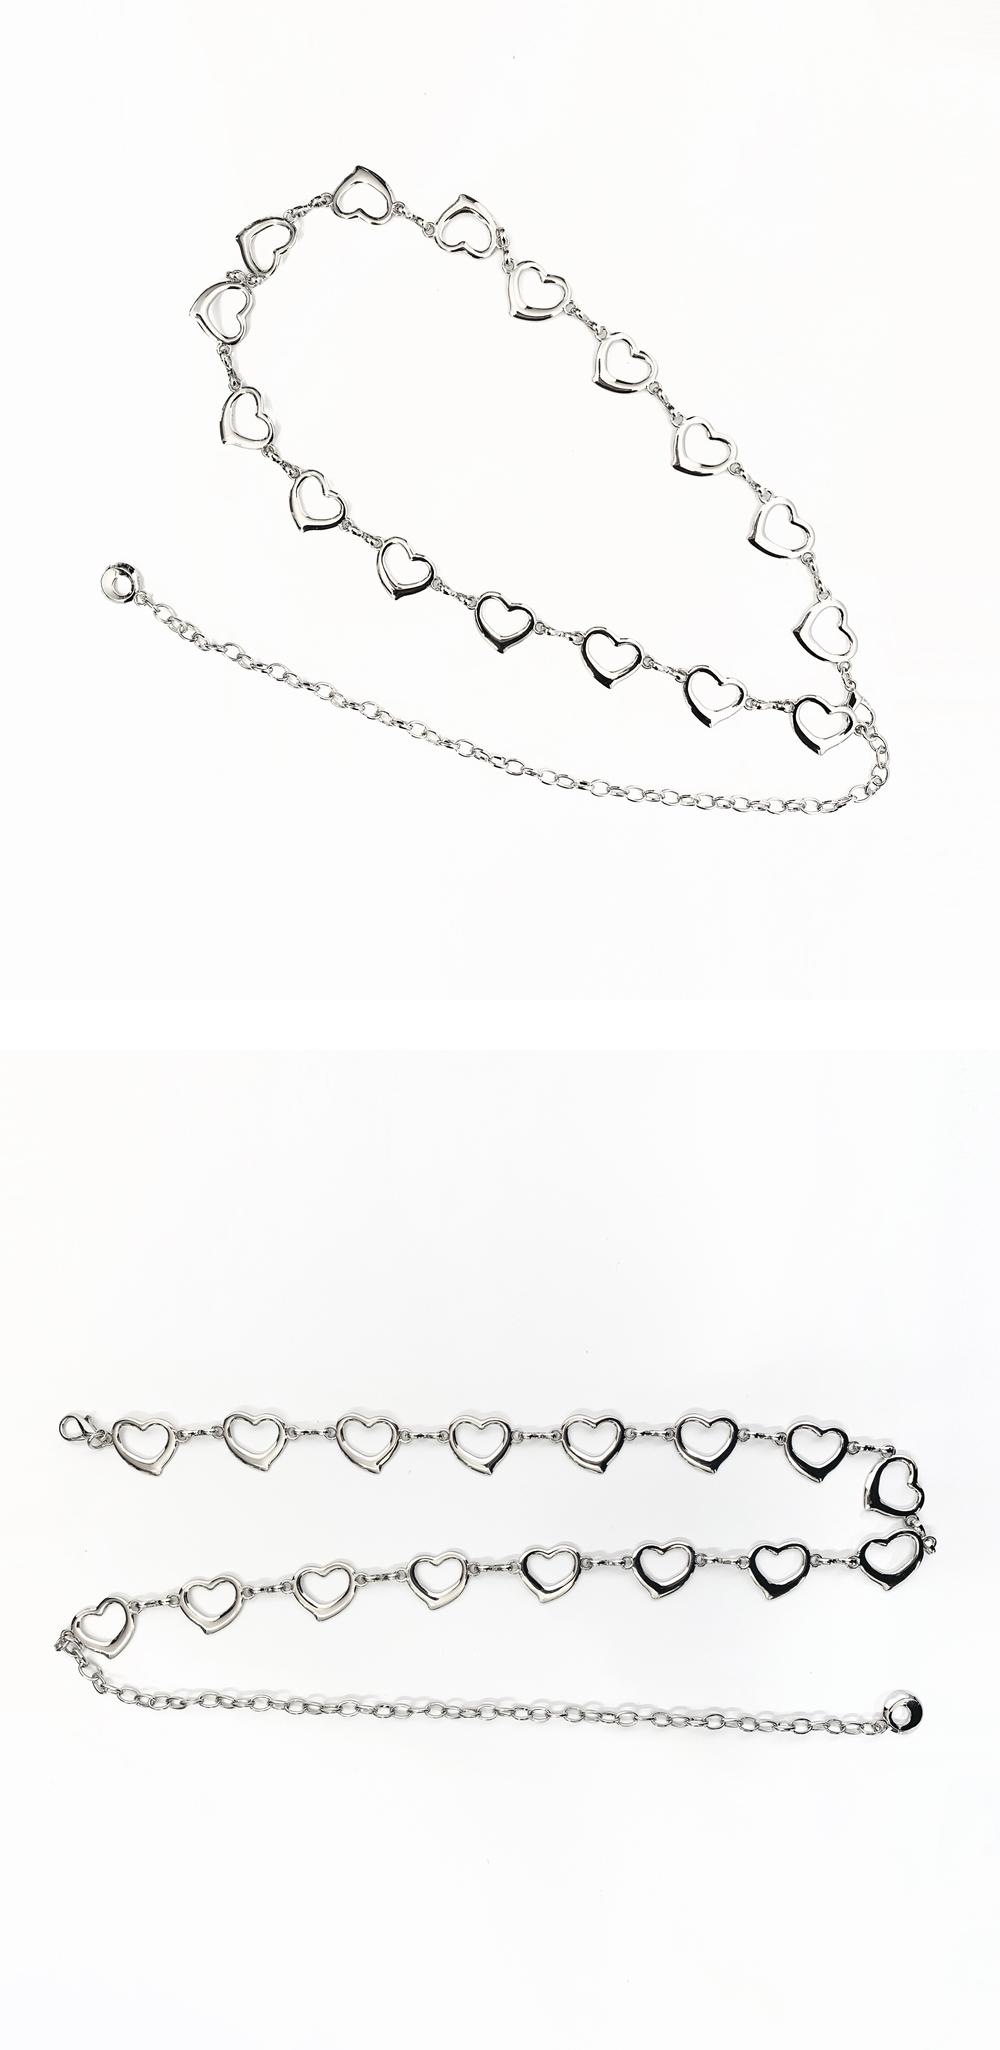 Lovebin heart chain belt